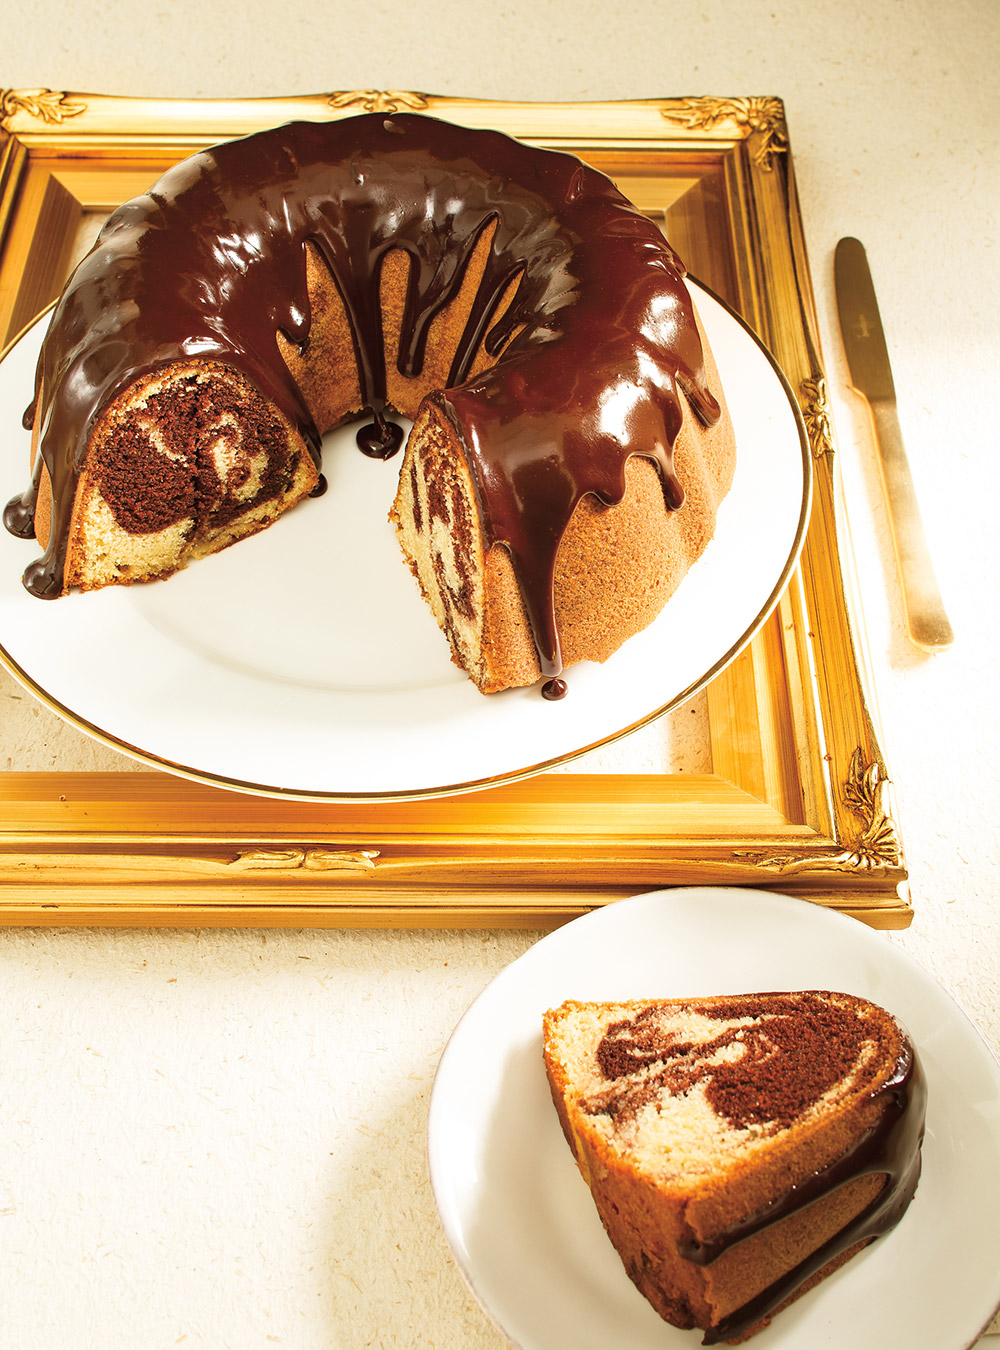 Gâteau bundt marbré au chocolat | ricardo